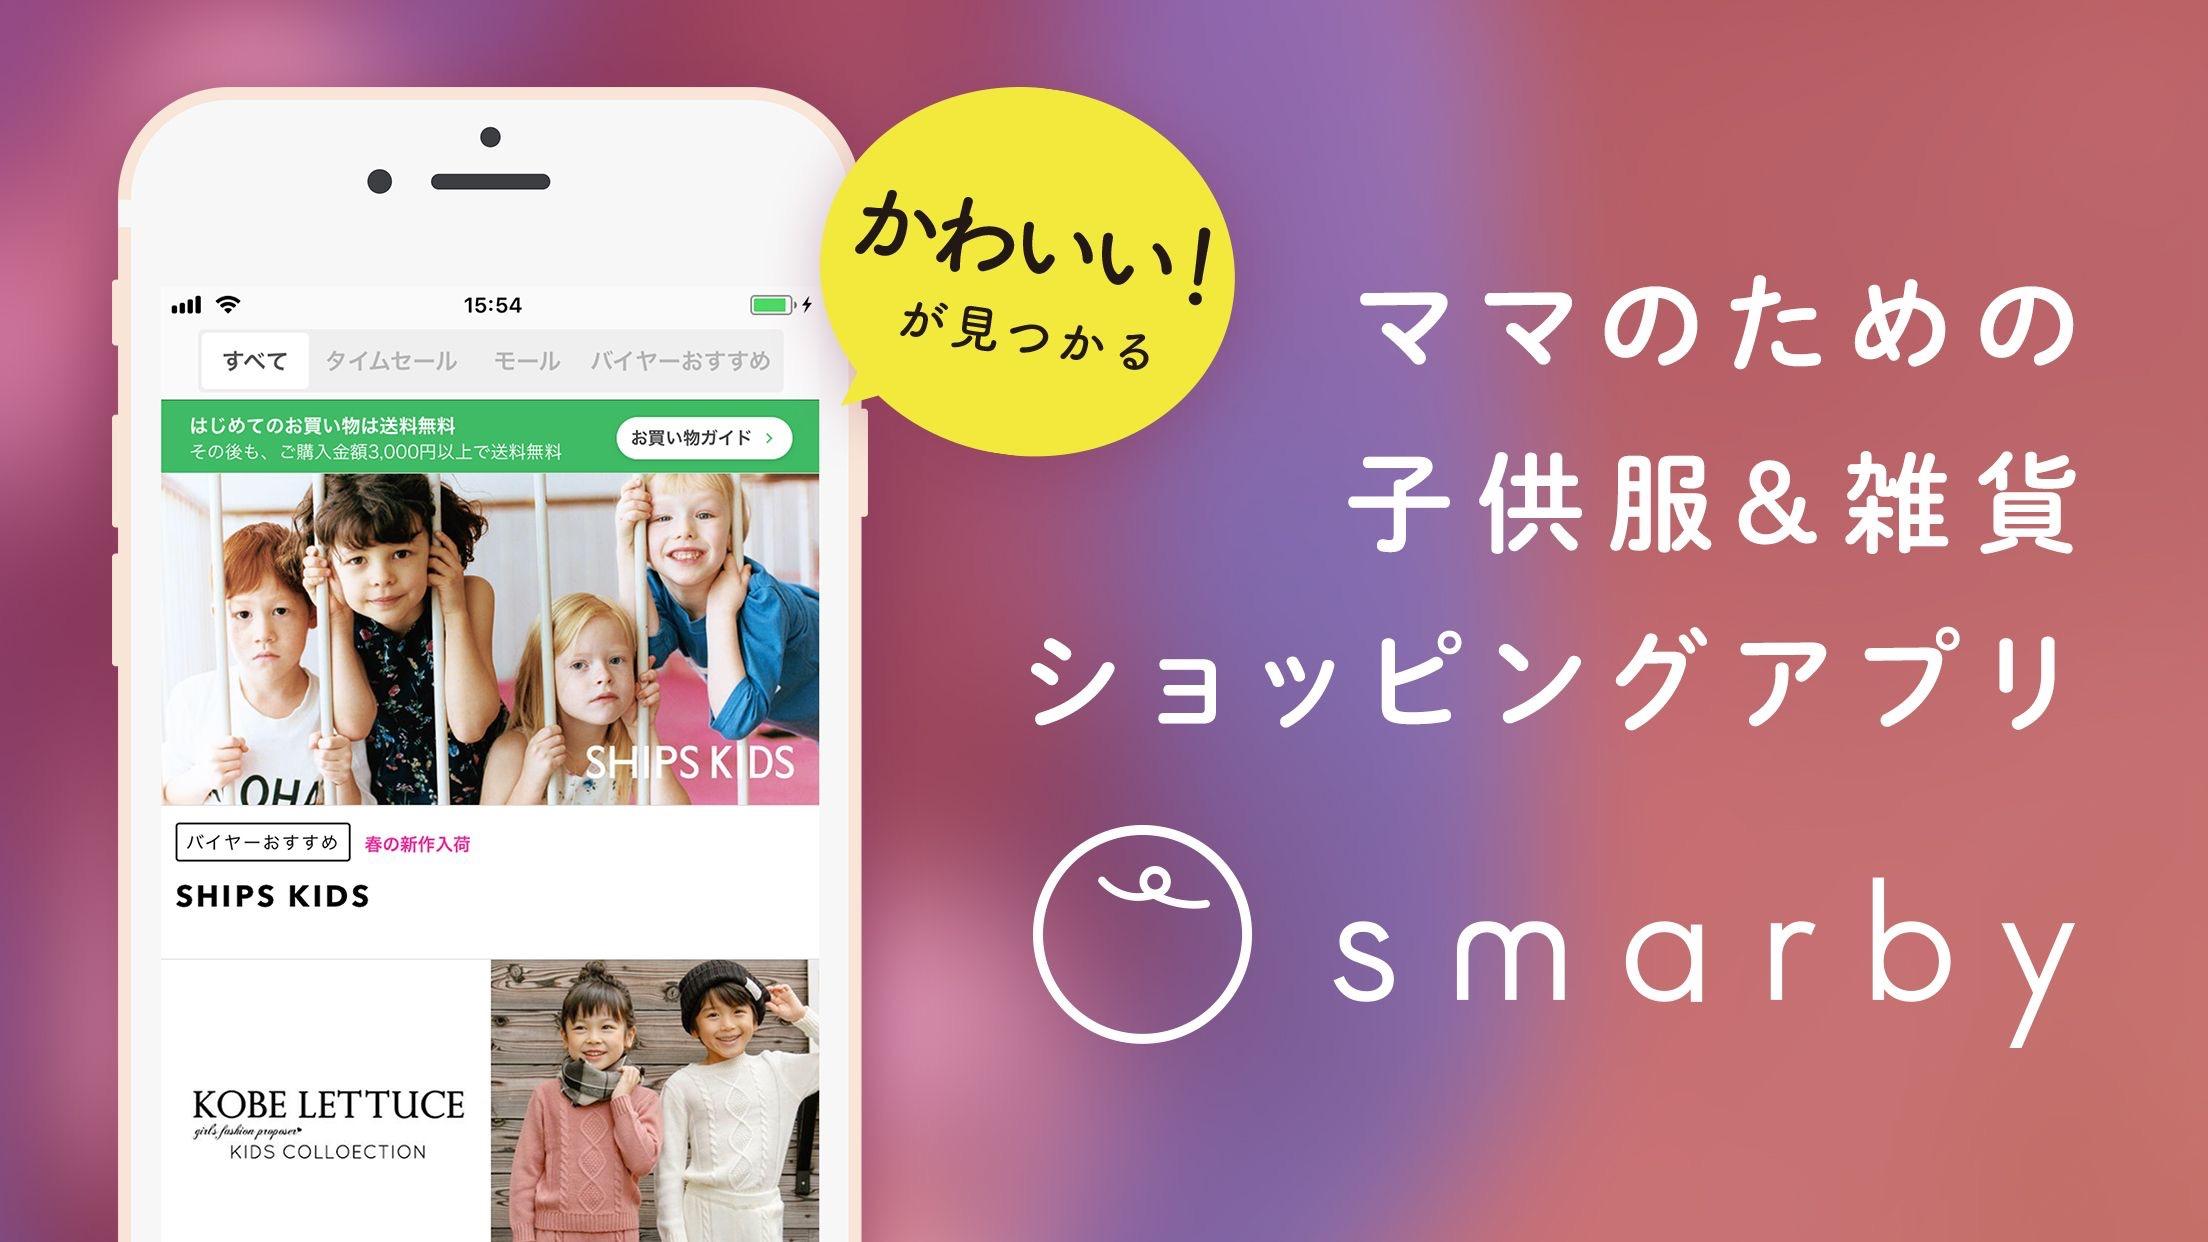 smarby(スマービー) ママのための通販アプリ Screenshot